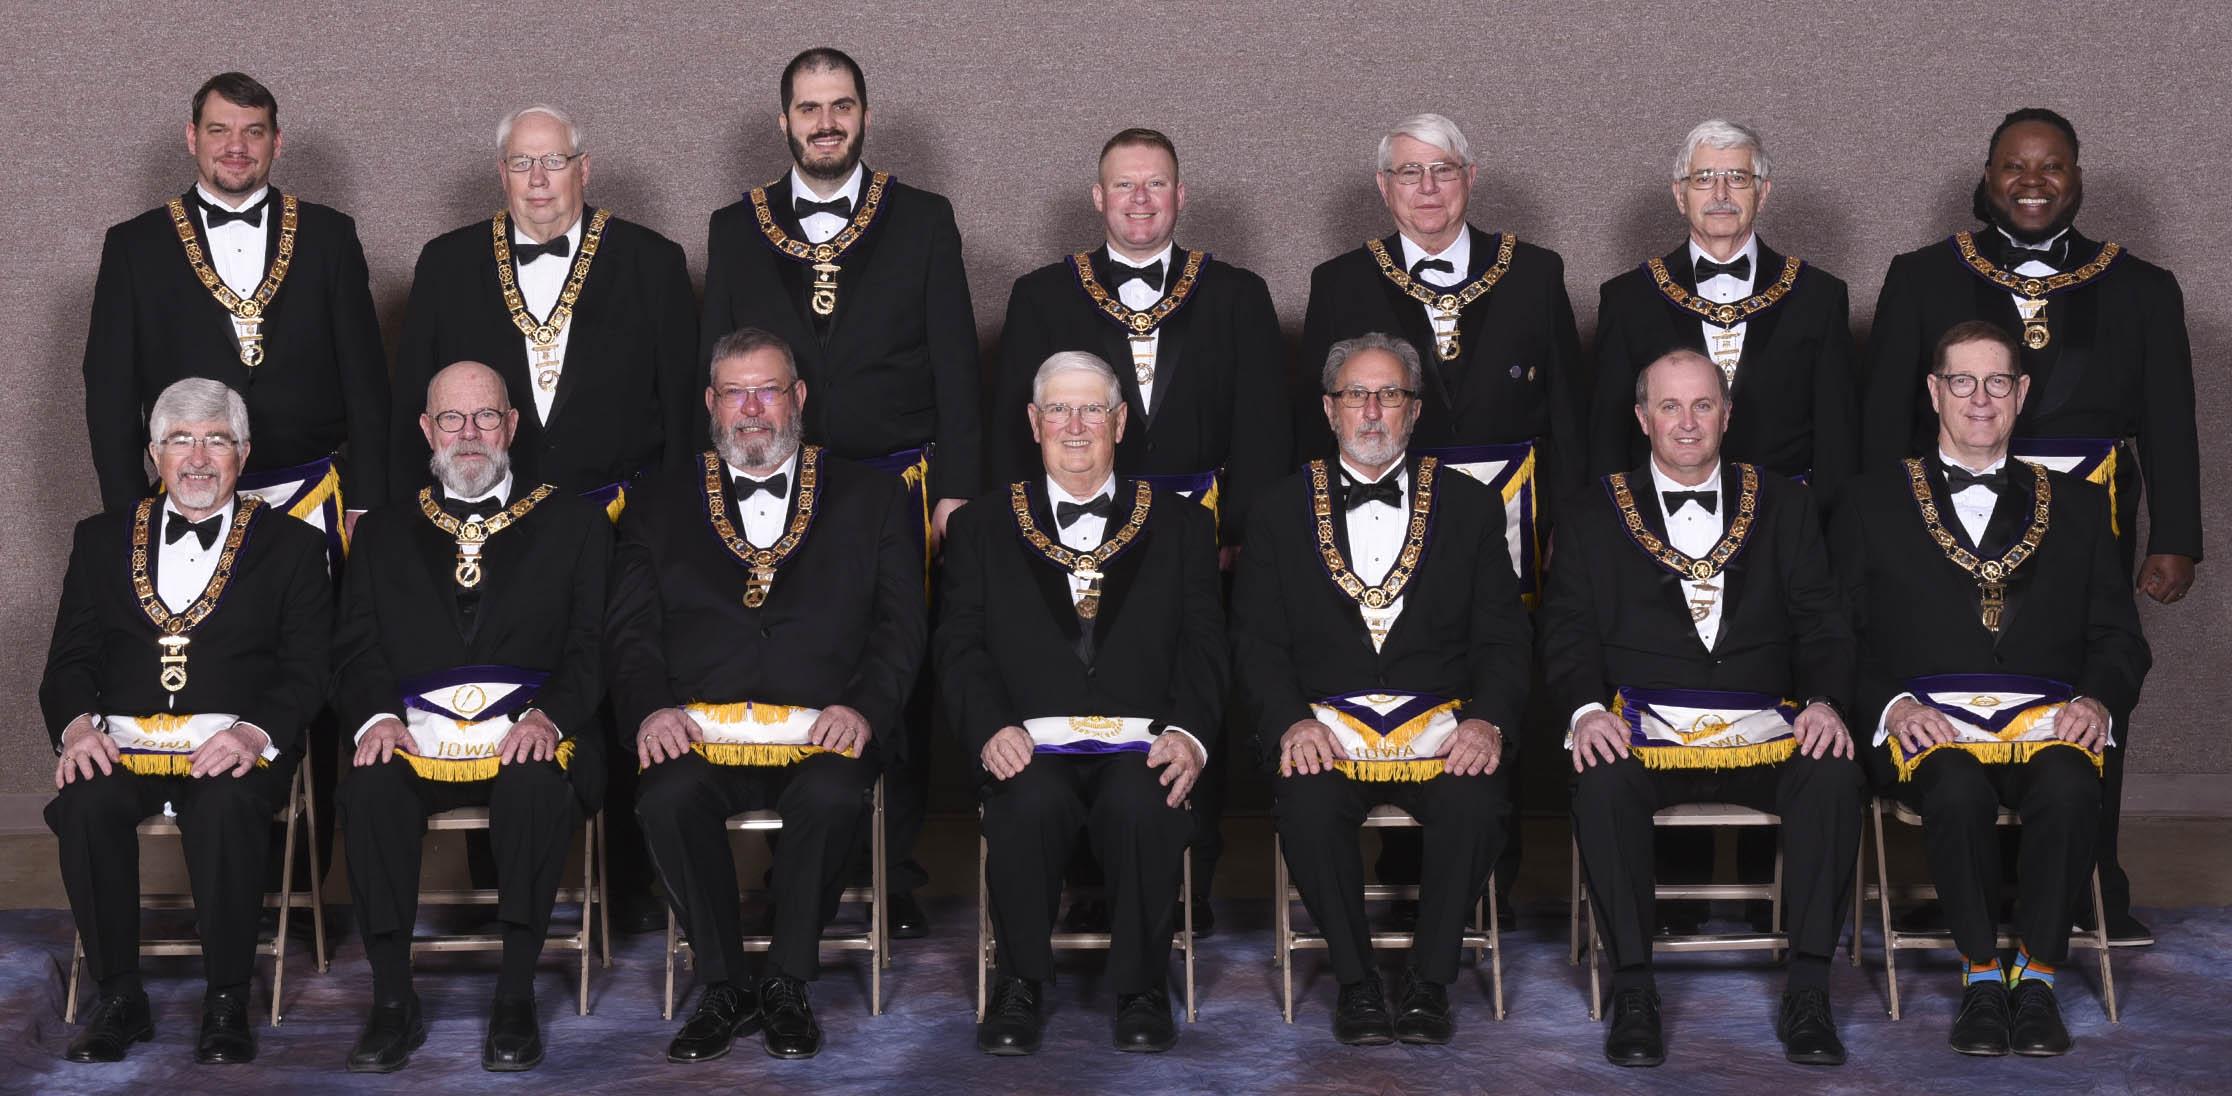 2020-2021 Grand Ldoge Officers